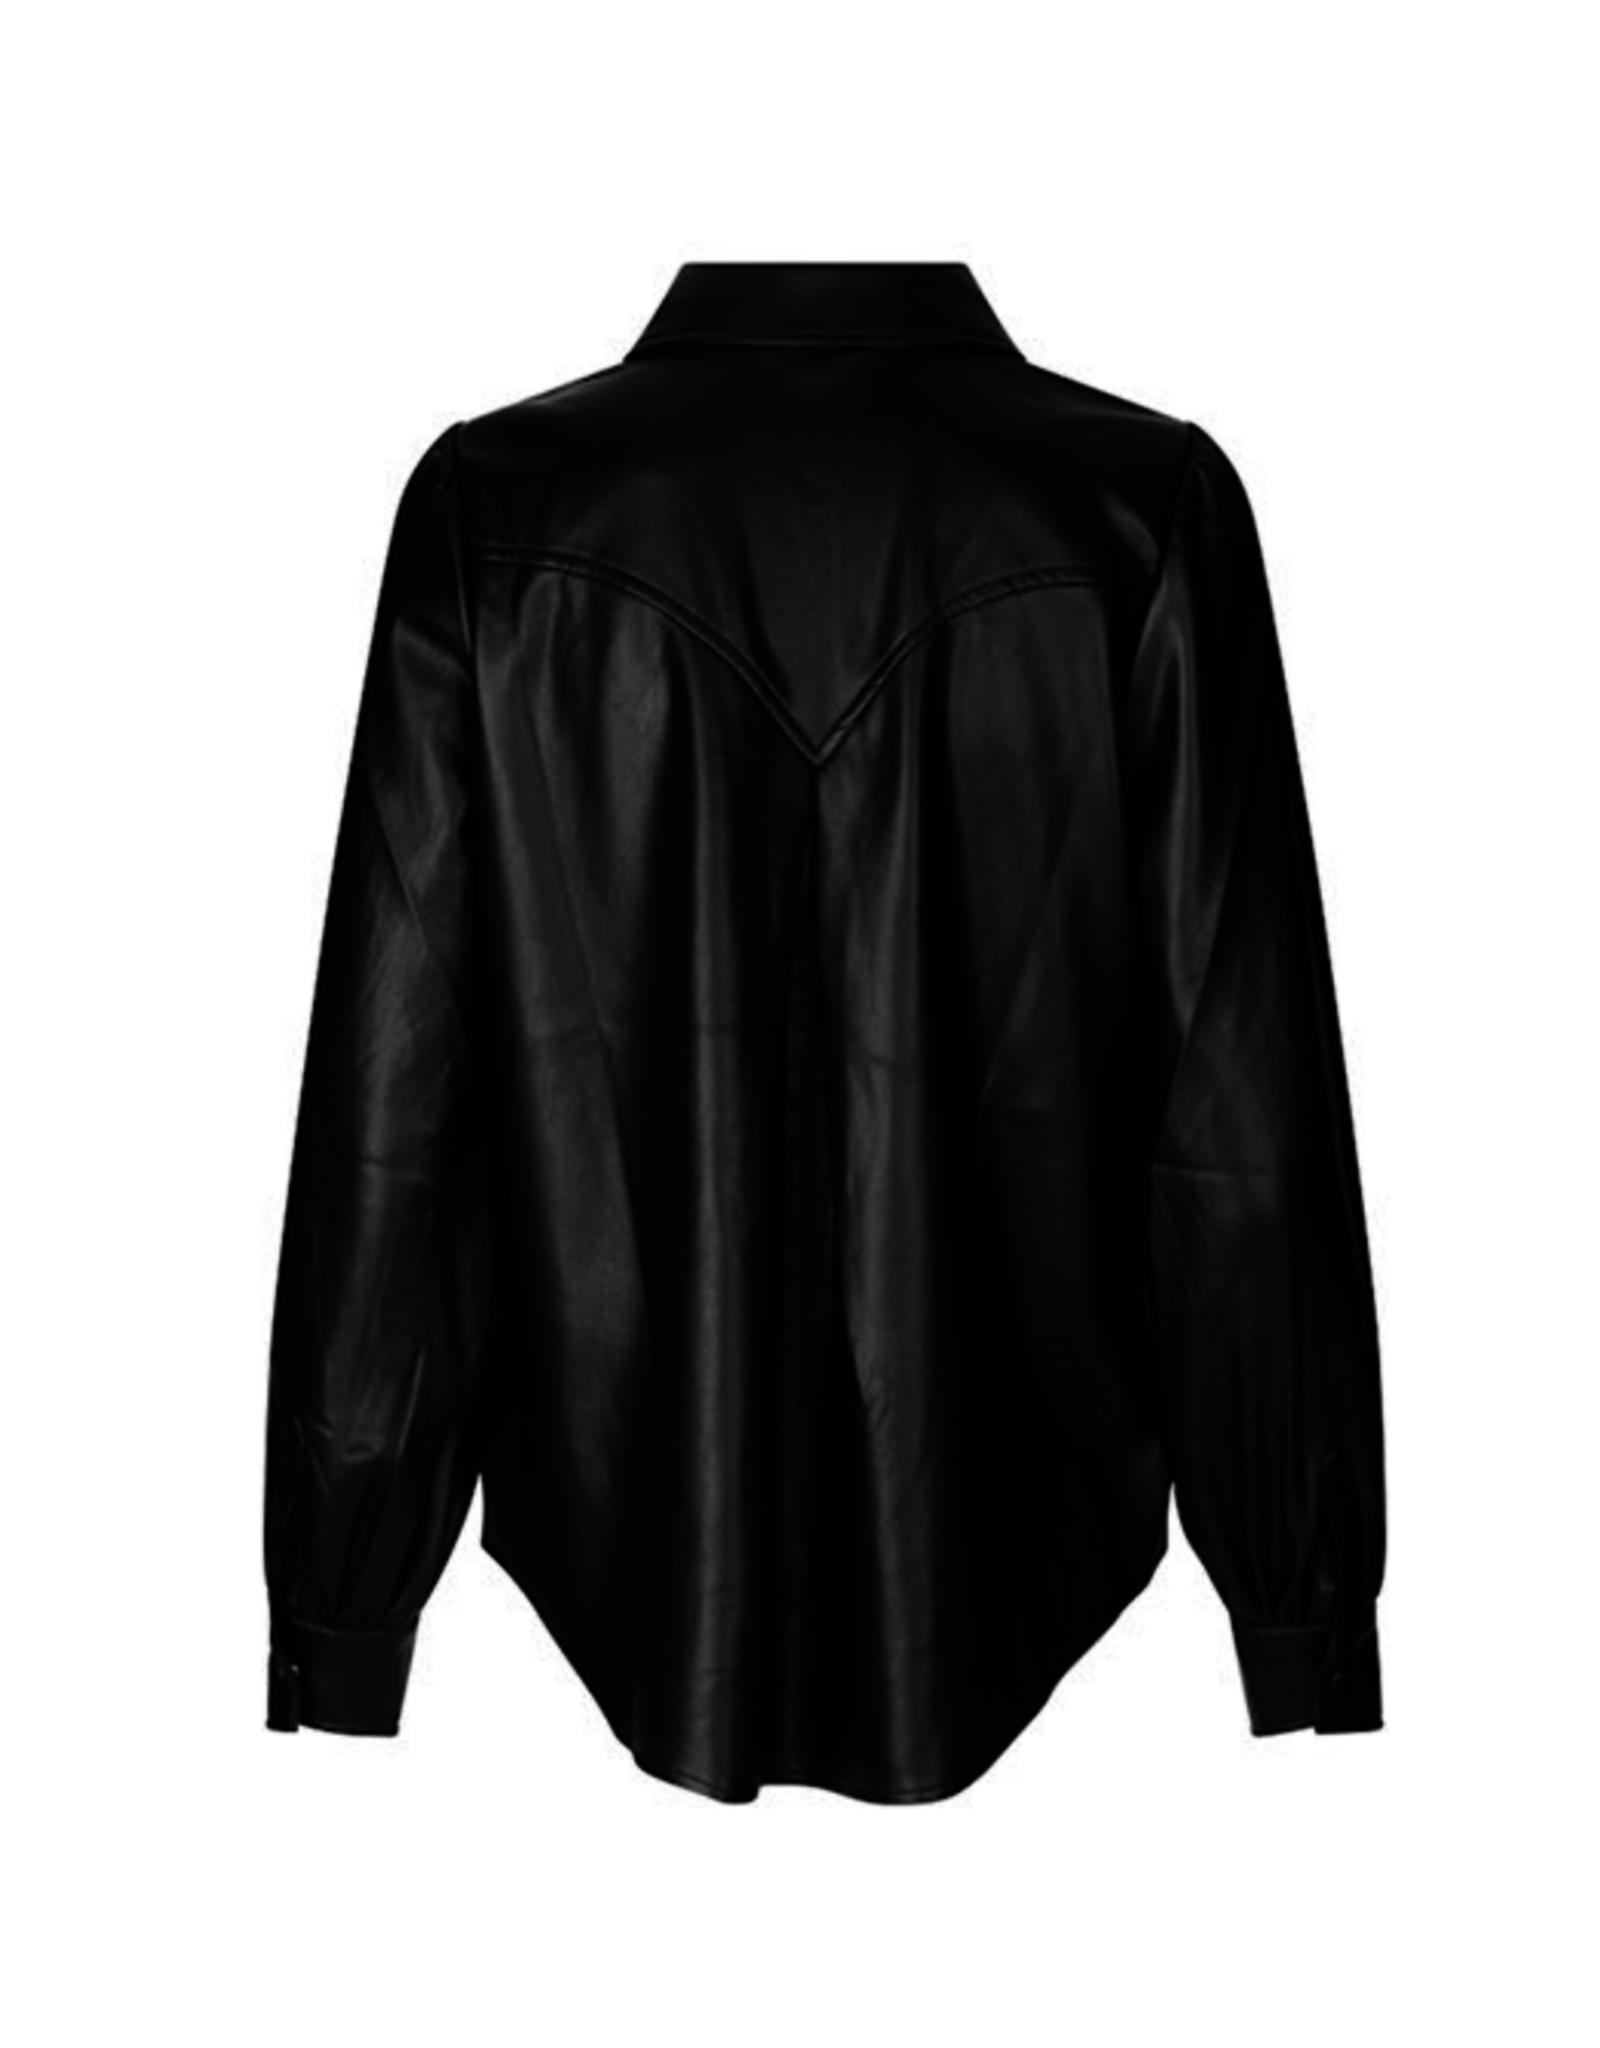 Daimi blouse black